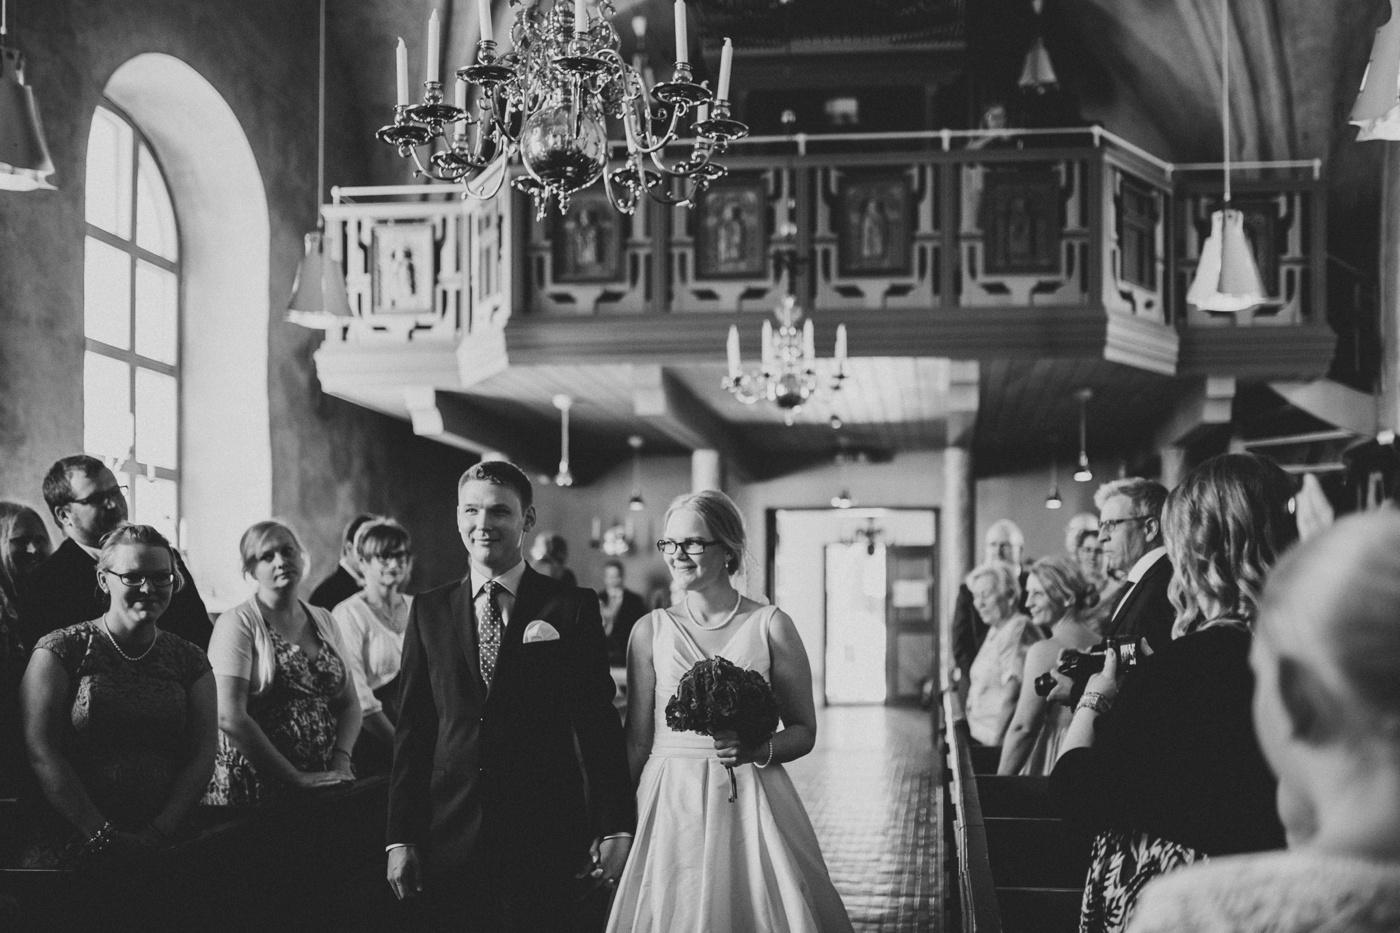 ceciliajoakim_sweden-countryside-summer-wedding_melbourne-fun-quirky-wedding-photography_7